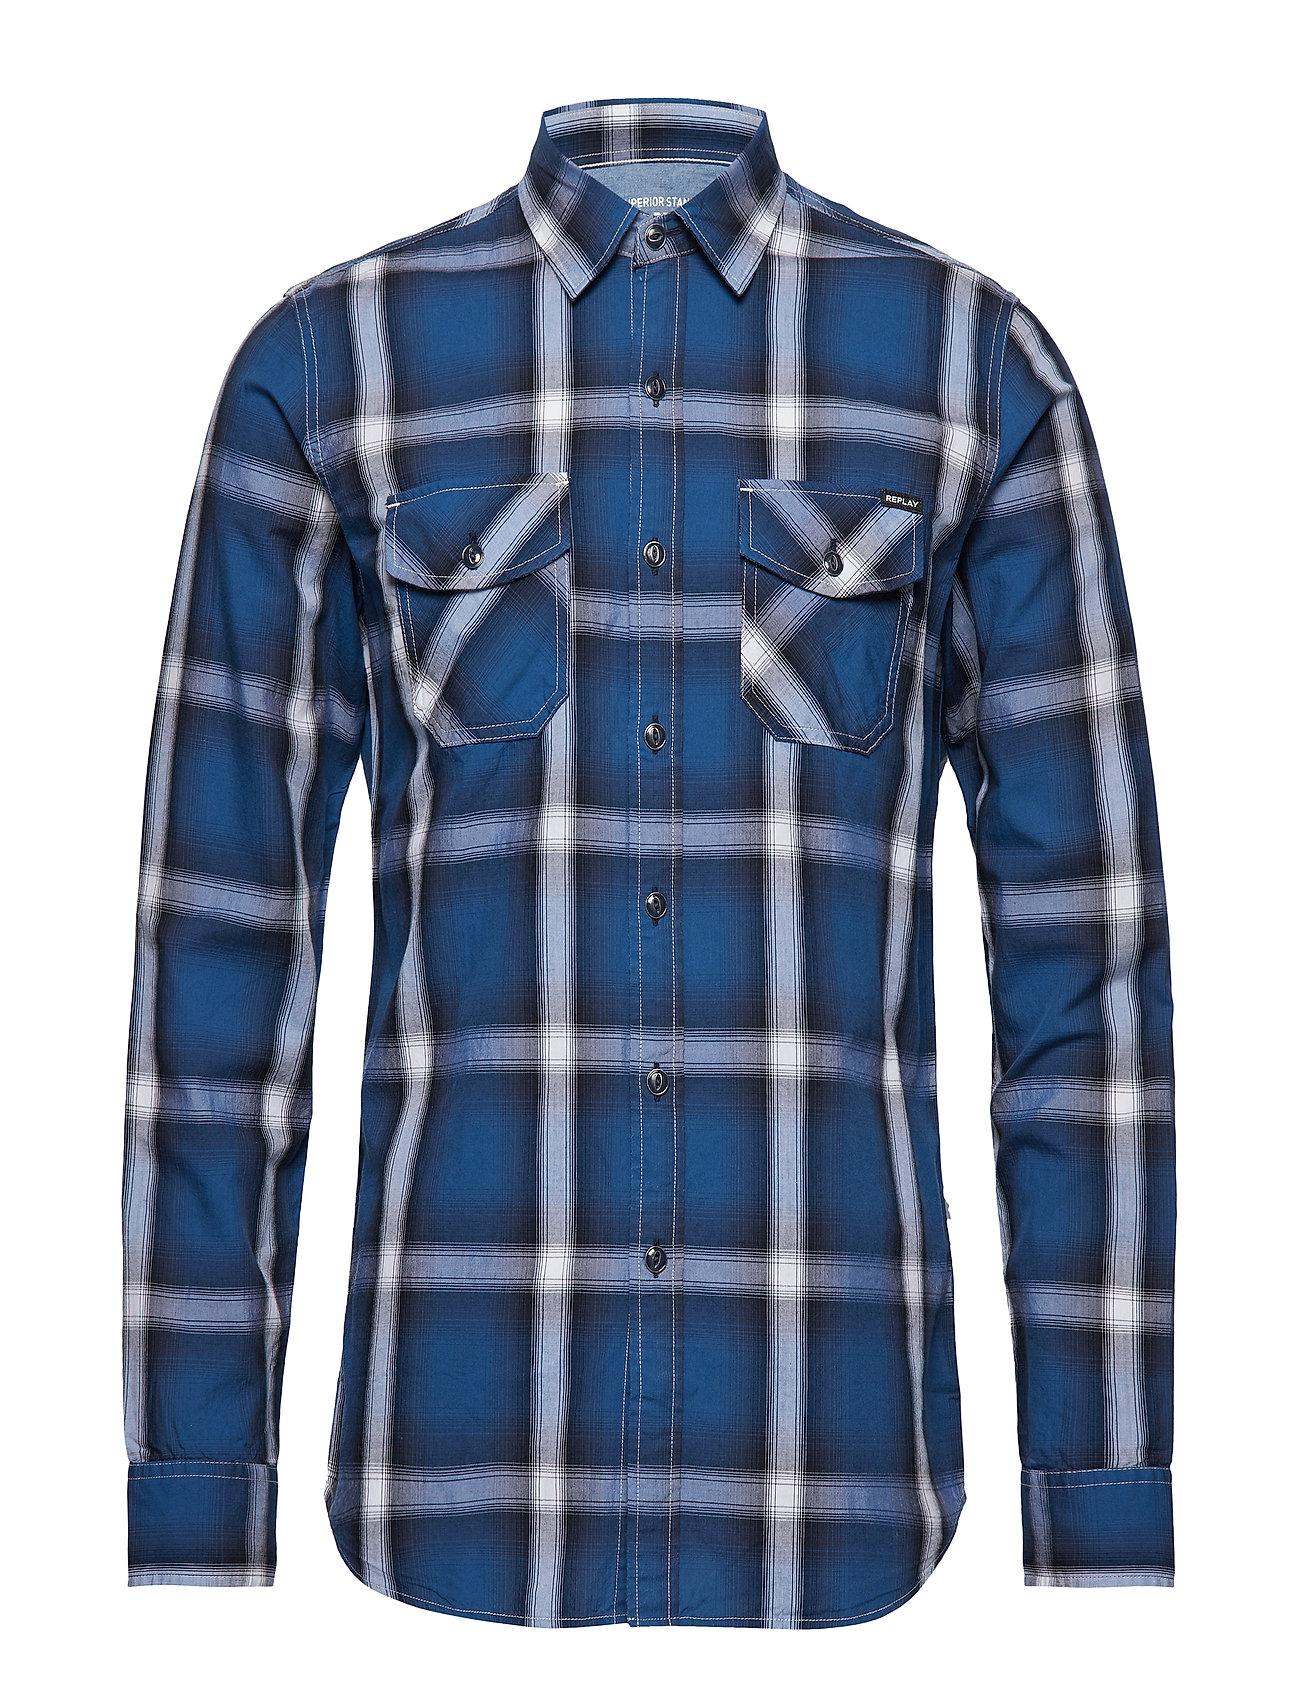 Replay Shirt - BLUE/WHITE/BLACK CHECK